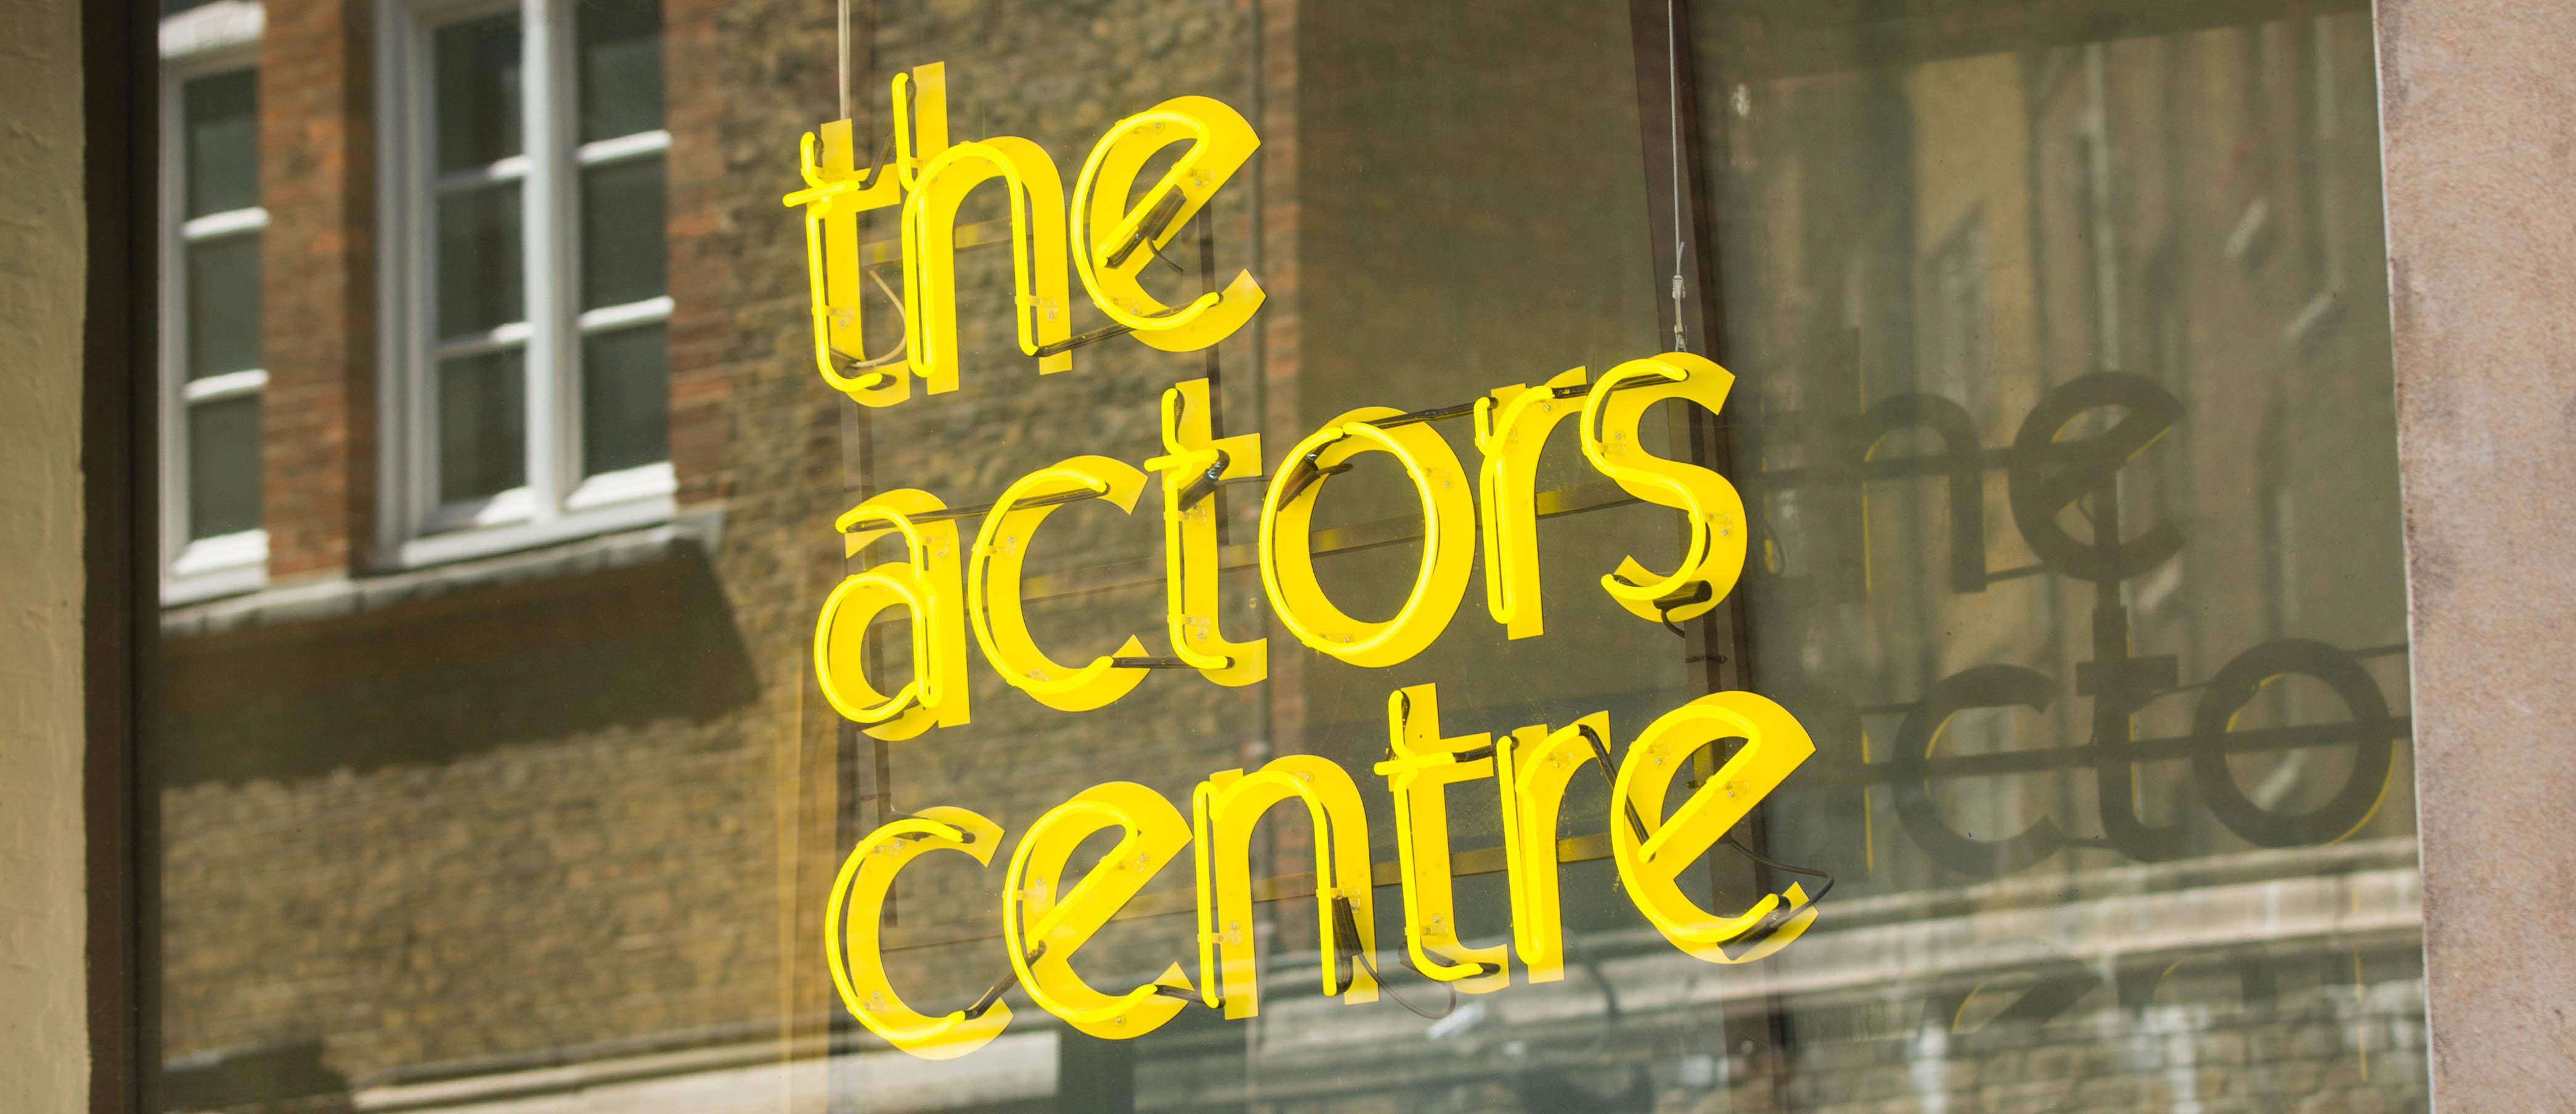 The Actors Centre, Soho